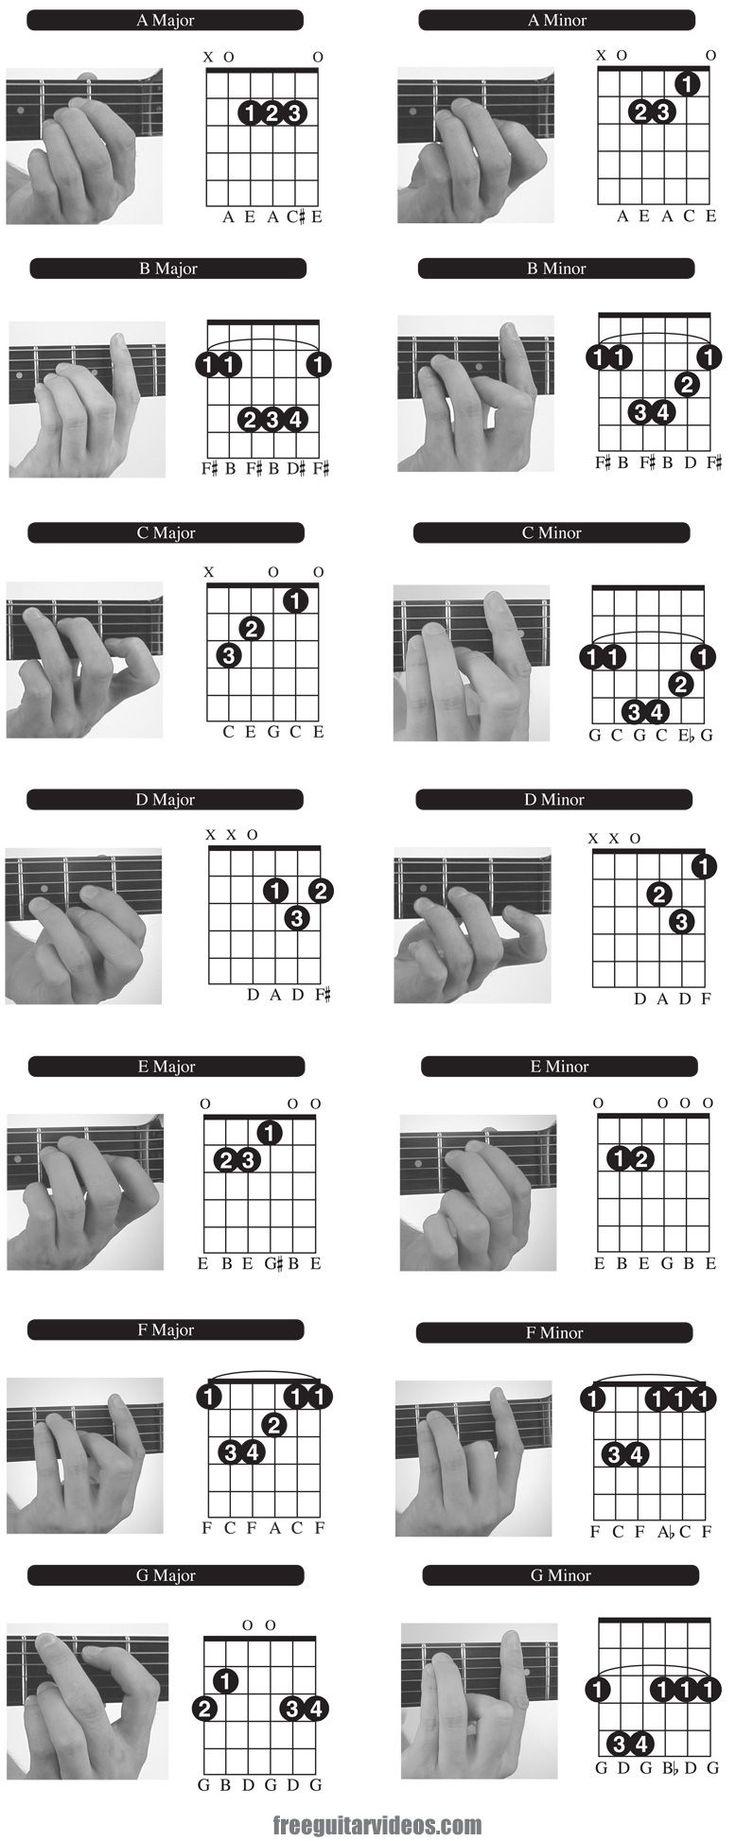 17 best images about guitar on pinterest guitar chord chart charts and ukulele chords. Black Bedroom Furniture Sets. Home Design Ideas